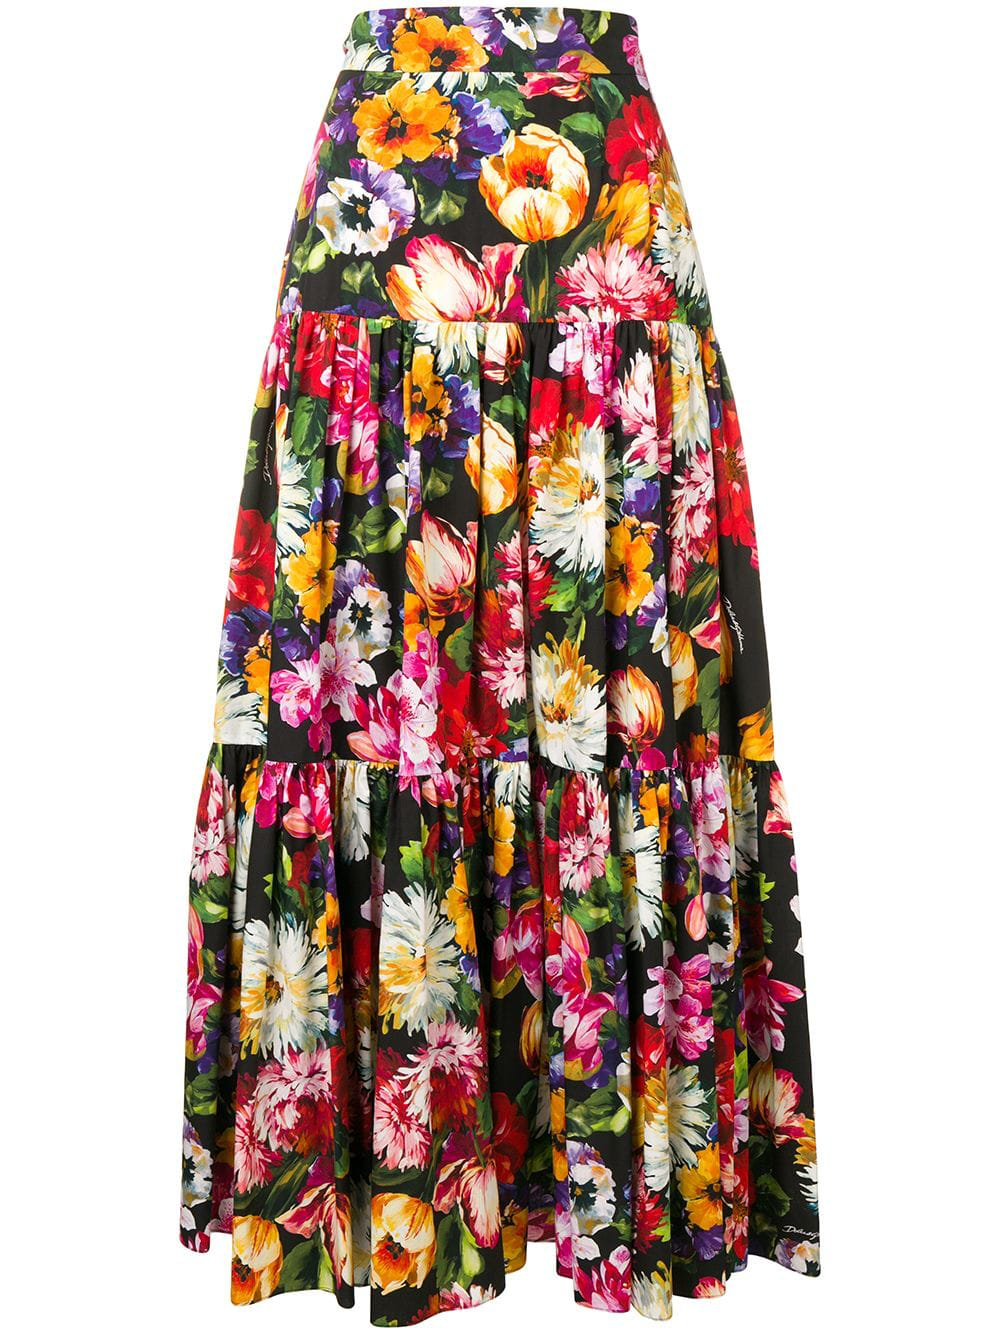 0ce7d675c129e1 Dolce & Gabbana Tiered Ruffled Floral-Print Cotton-Poplin Maxi Skirt In  Black